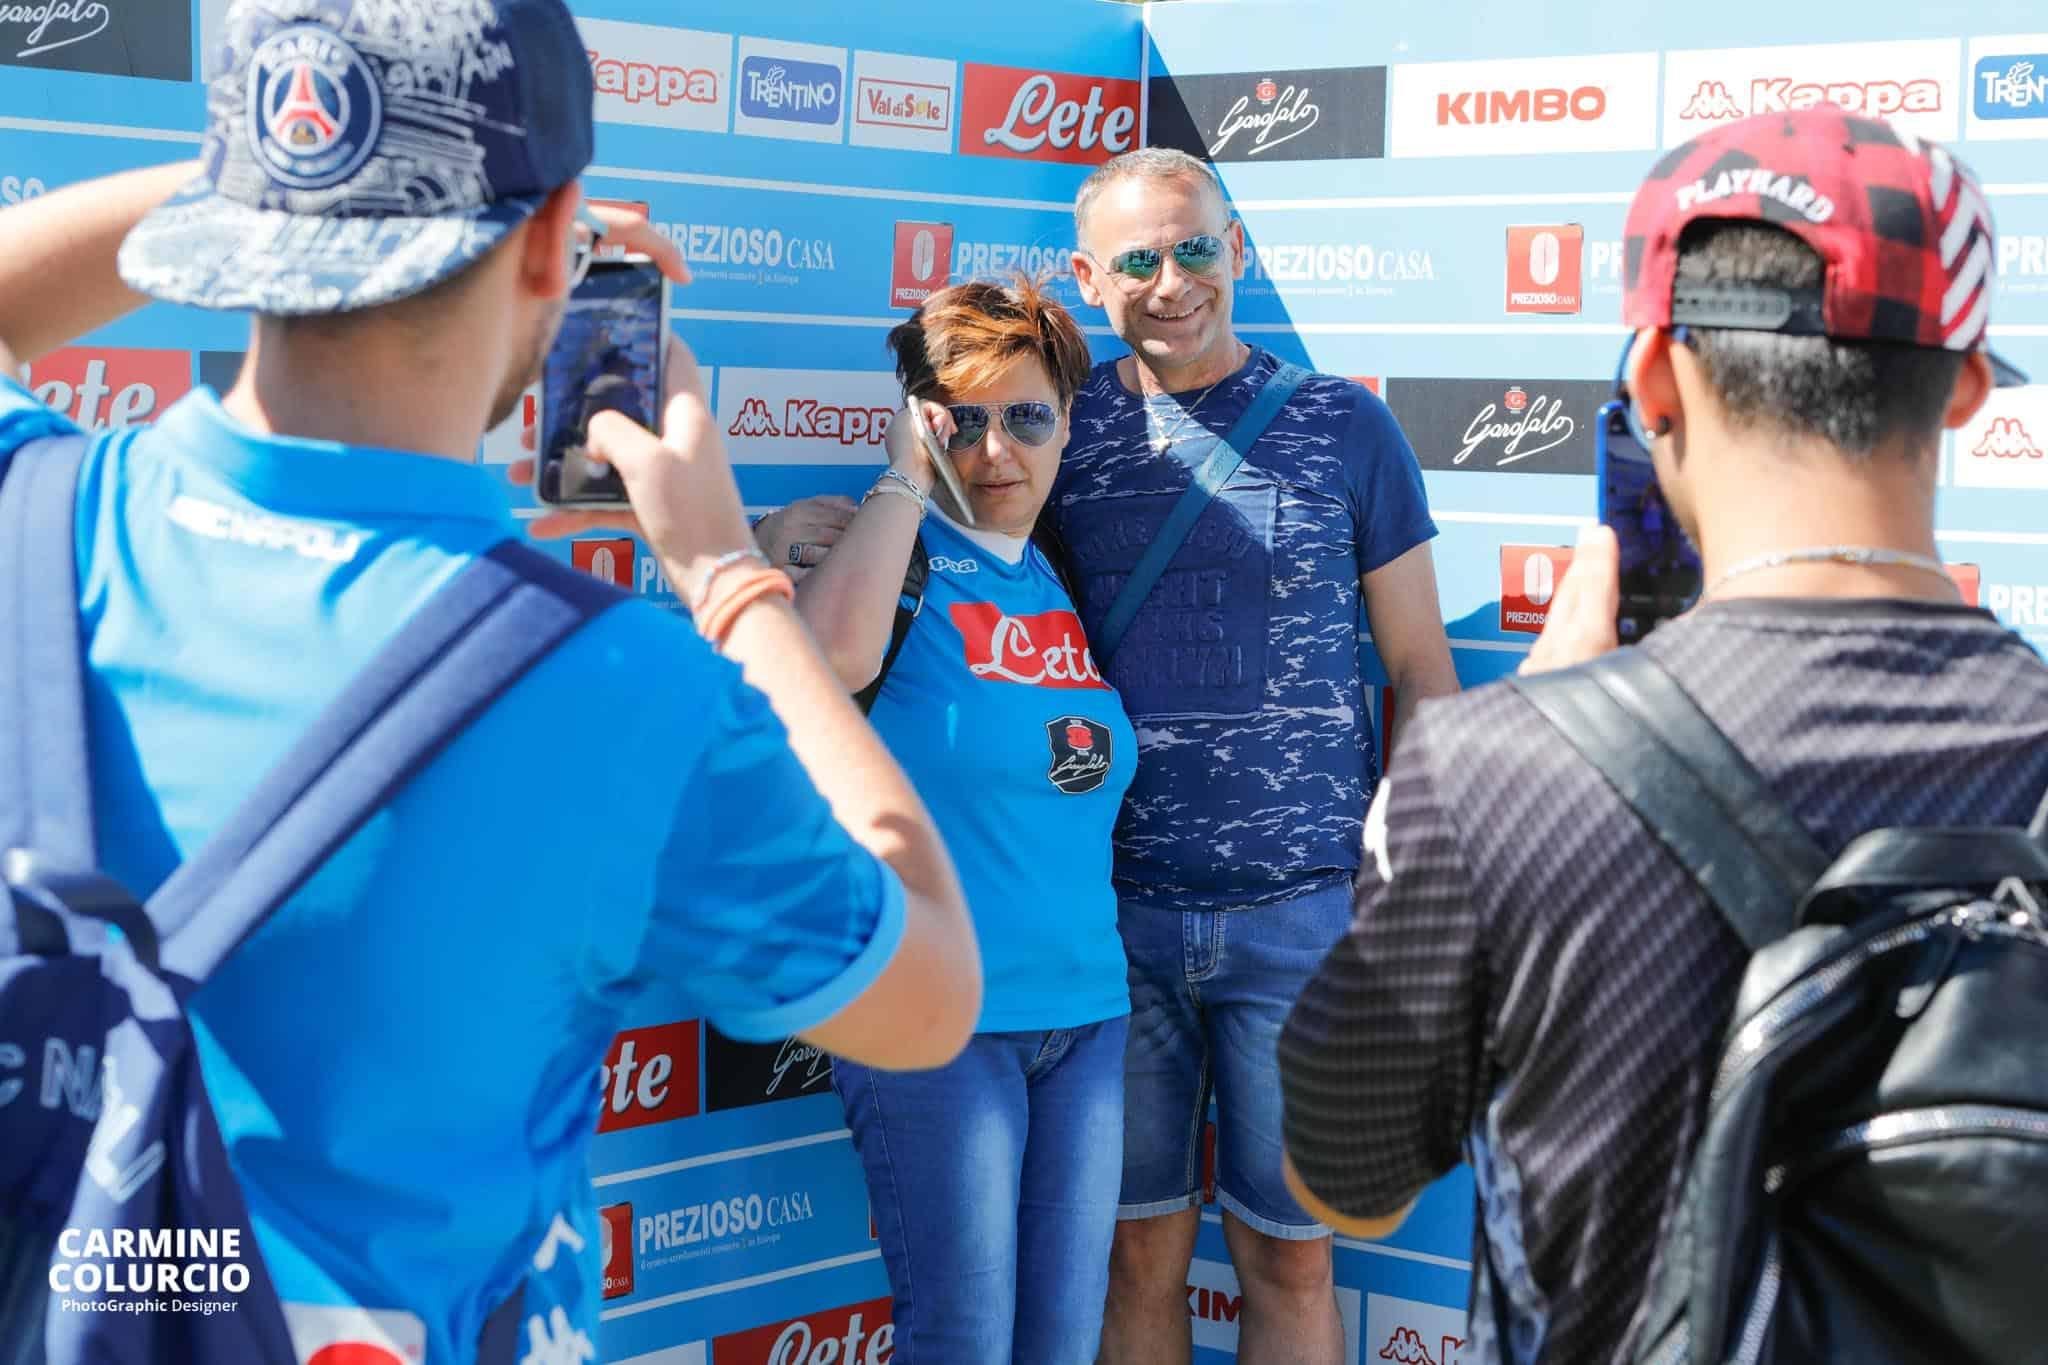 Speciale Dimaro - photo credit Carmine Colurcio